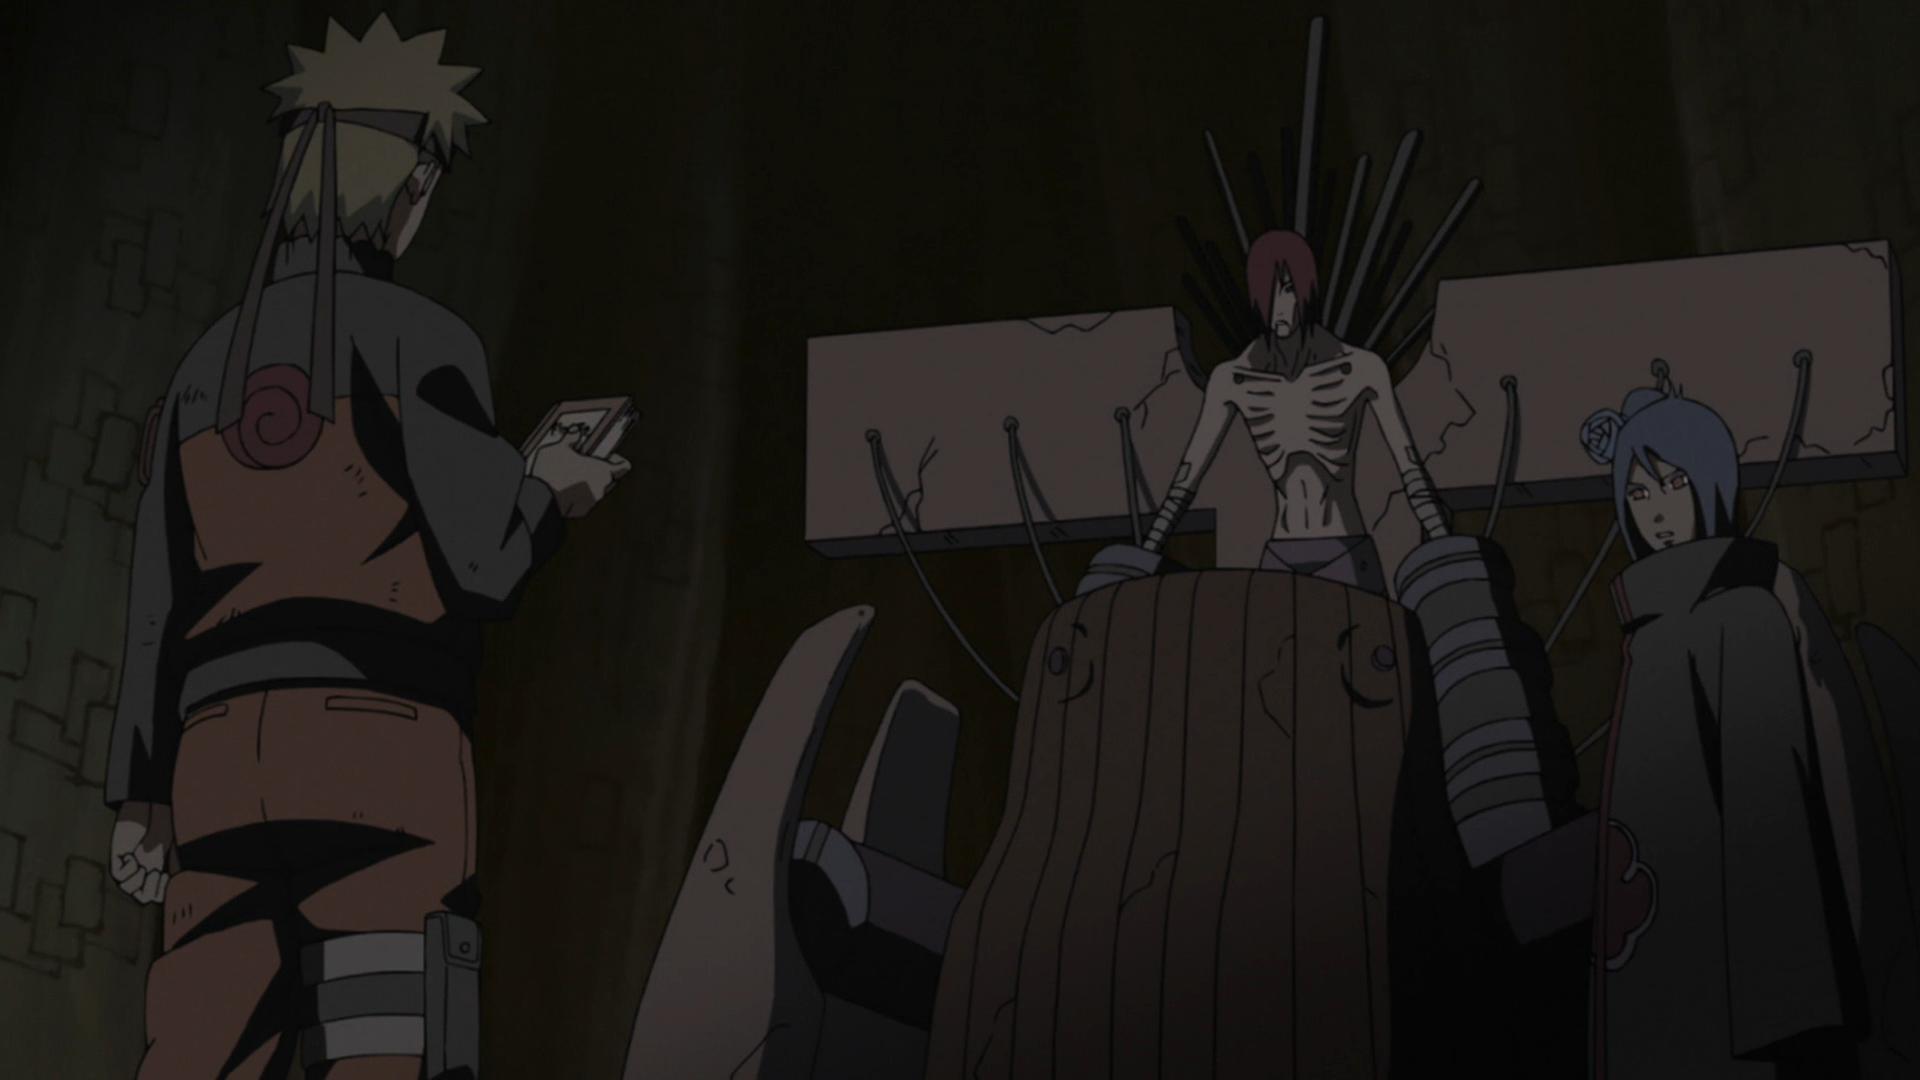 Jiraiya with Yahiko, Nagato and Konan #naruto | Naruto | Pinterest ...